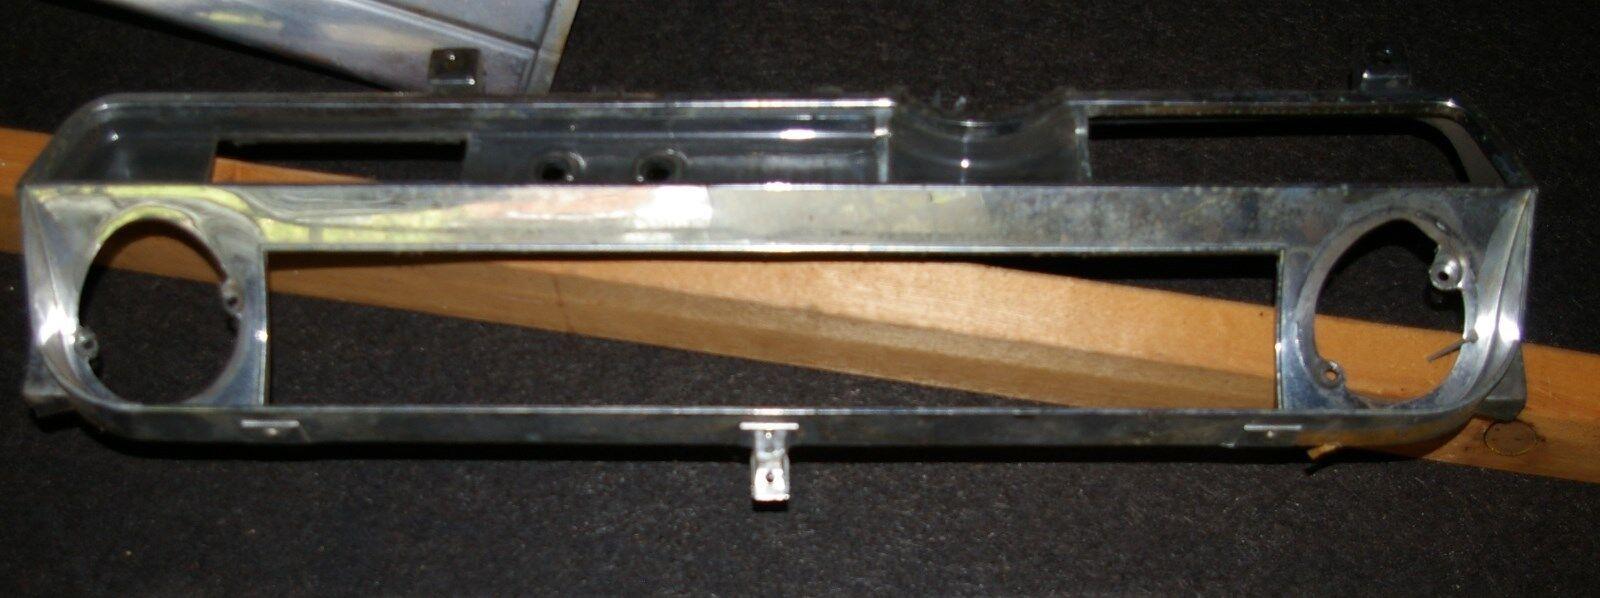 1963 1964 CADILLAC DASHBOARD SPEEDOMETER CHROME BEZEL 63 64 NICE